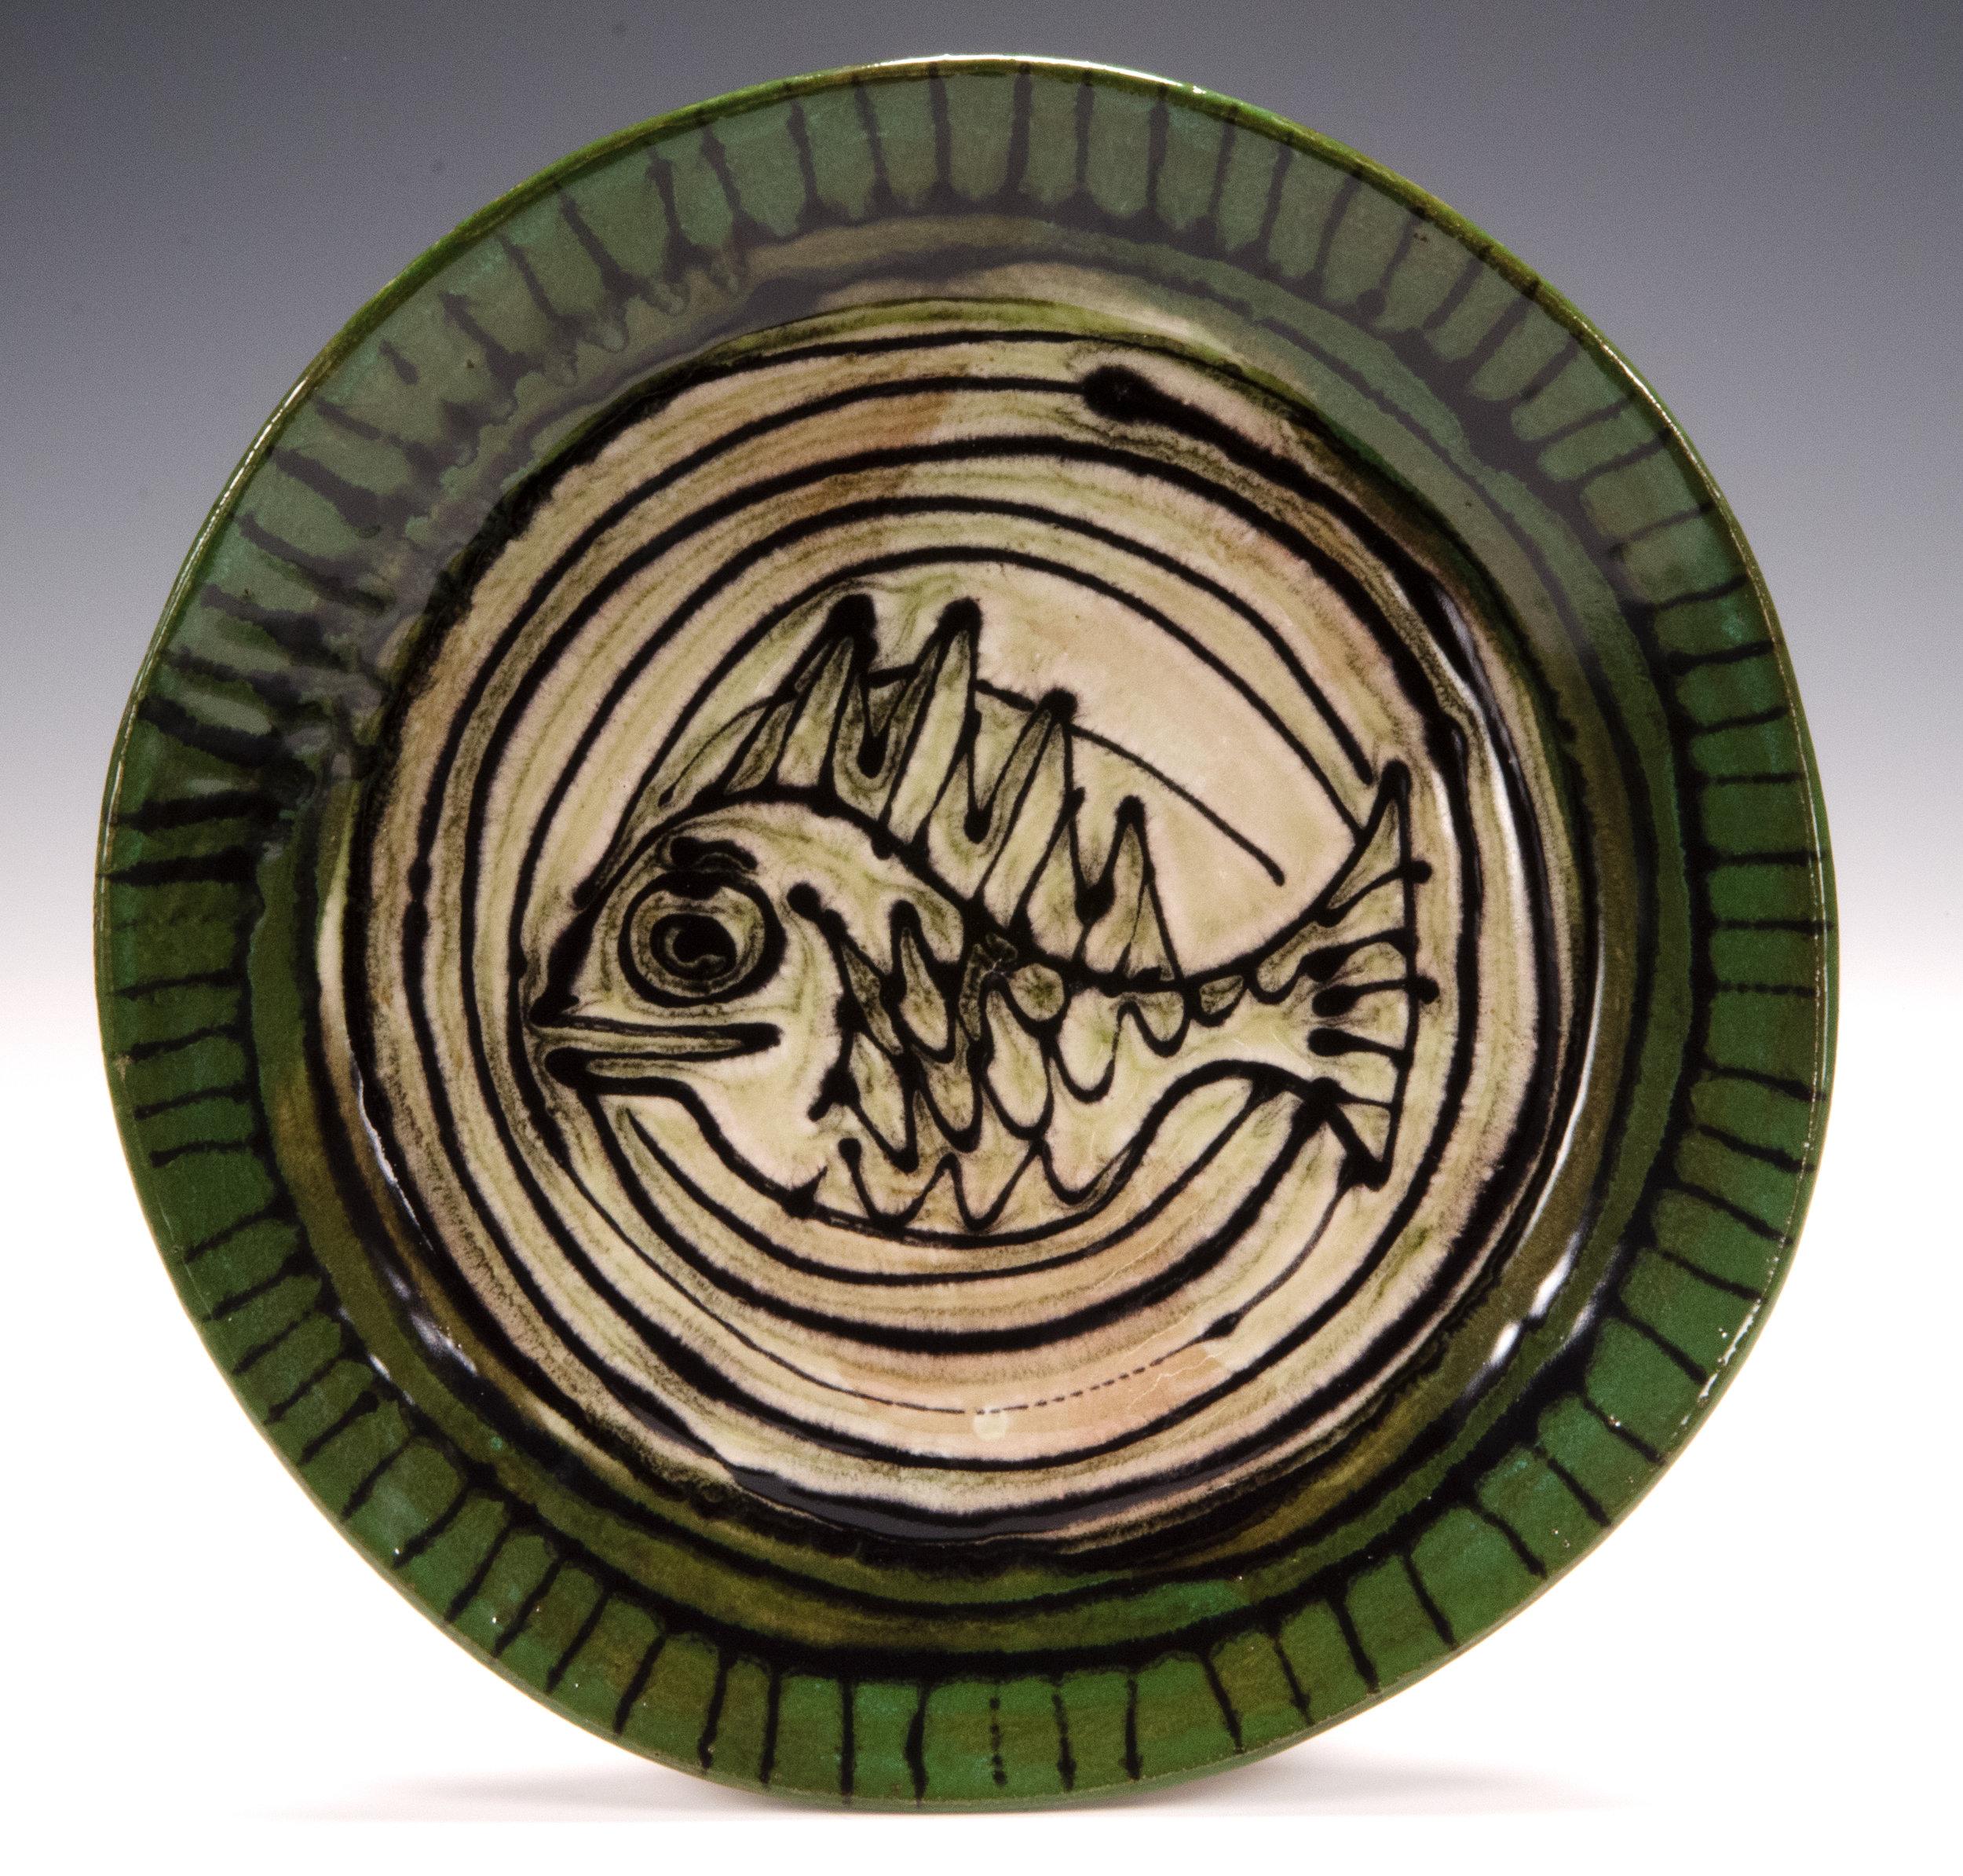 Dinner plate, 2016, slab made, stoneware, slip, stain, glaze 10.5 inches